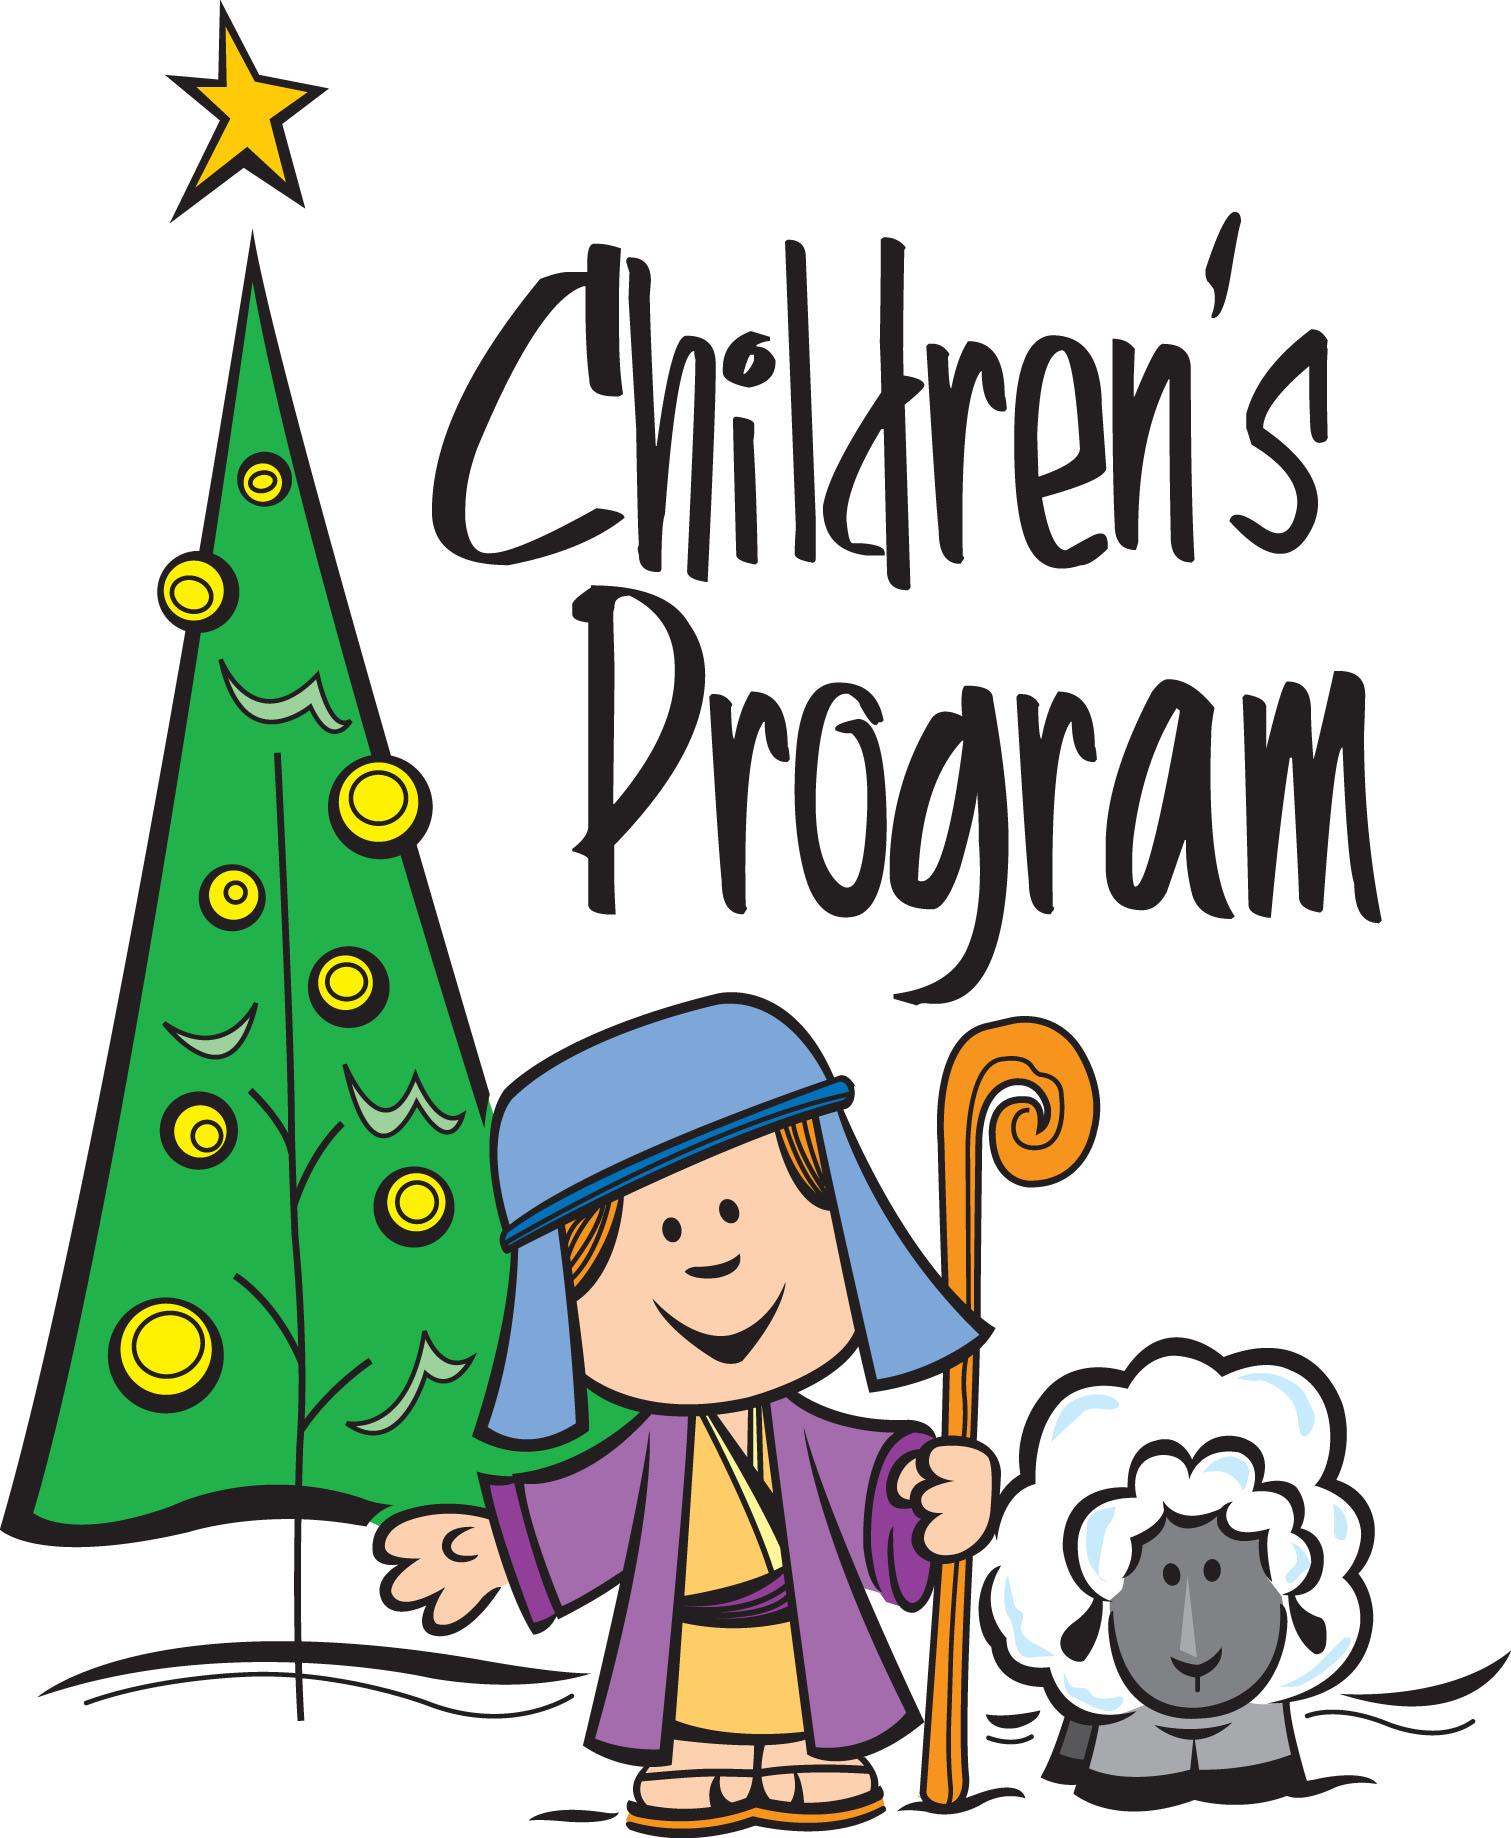 childrens christmas program 2018